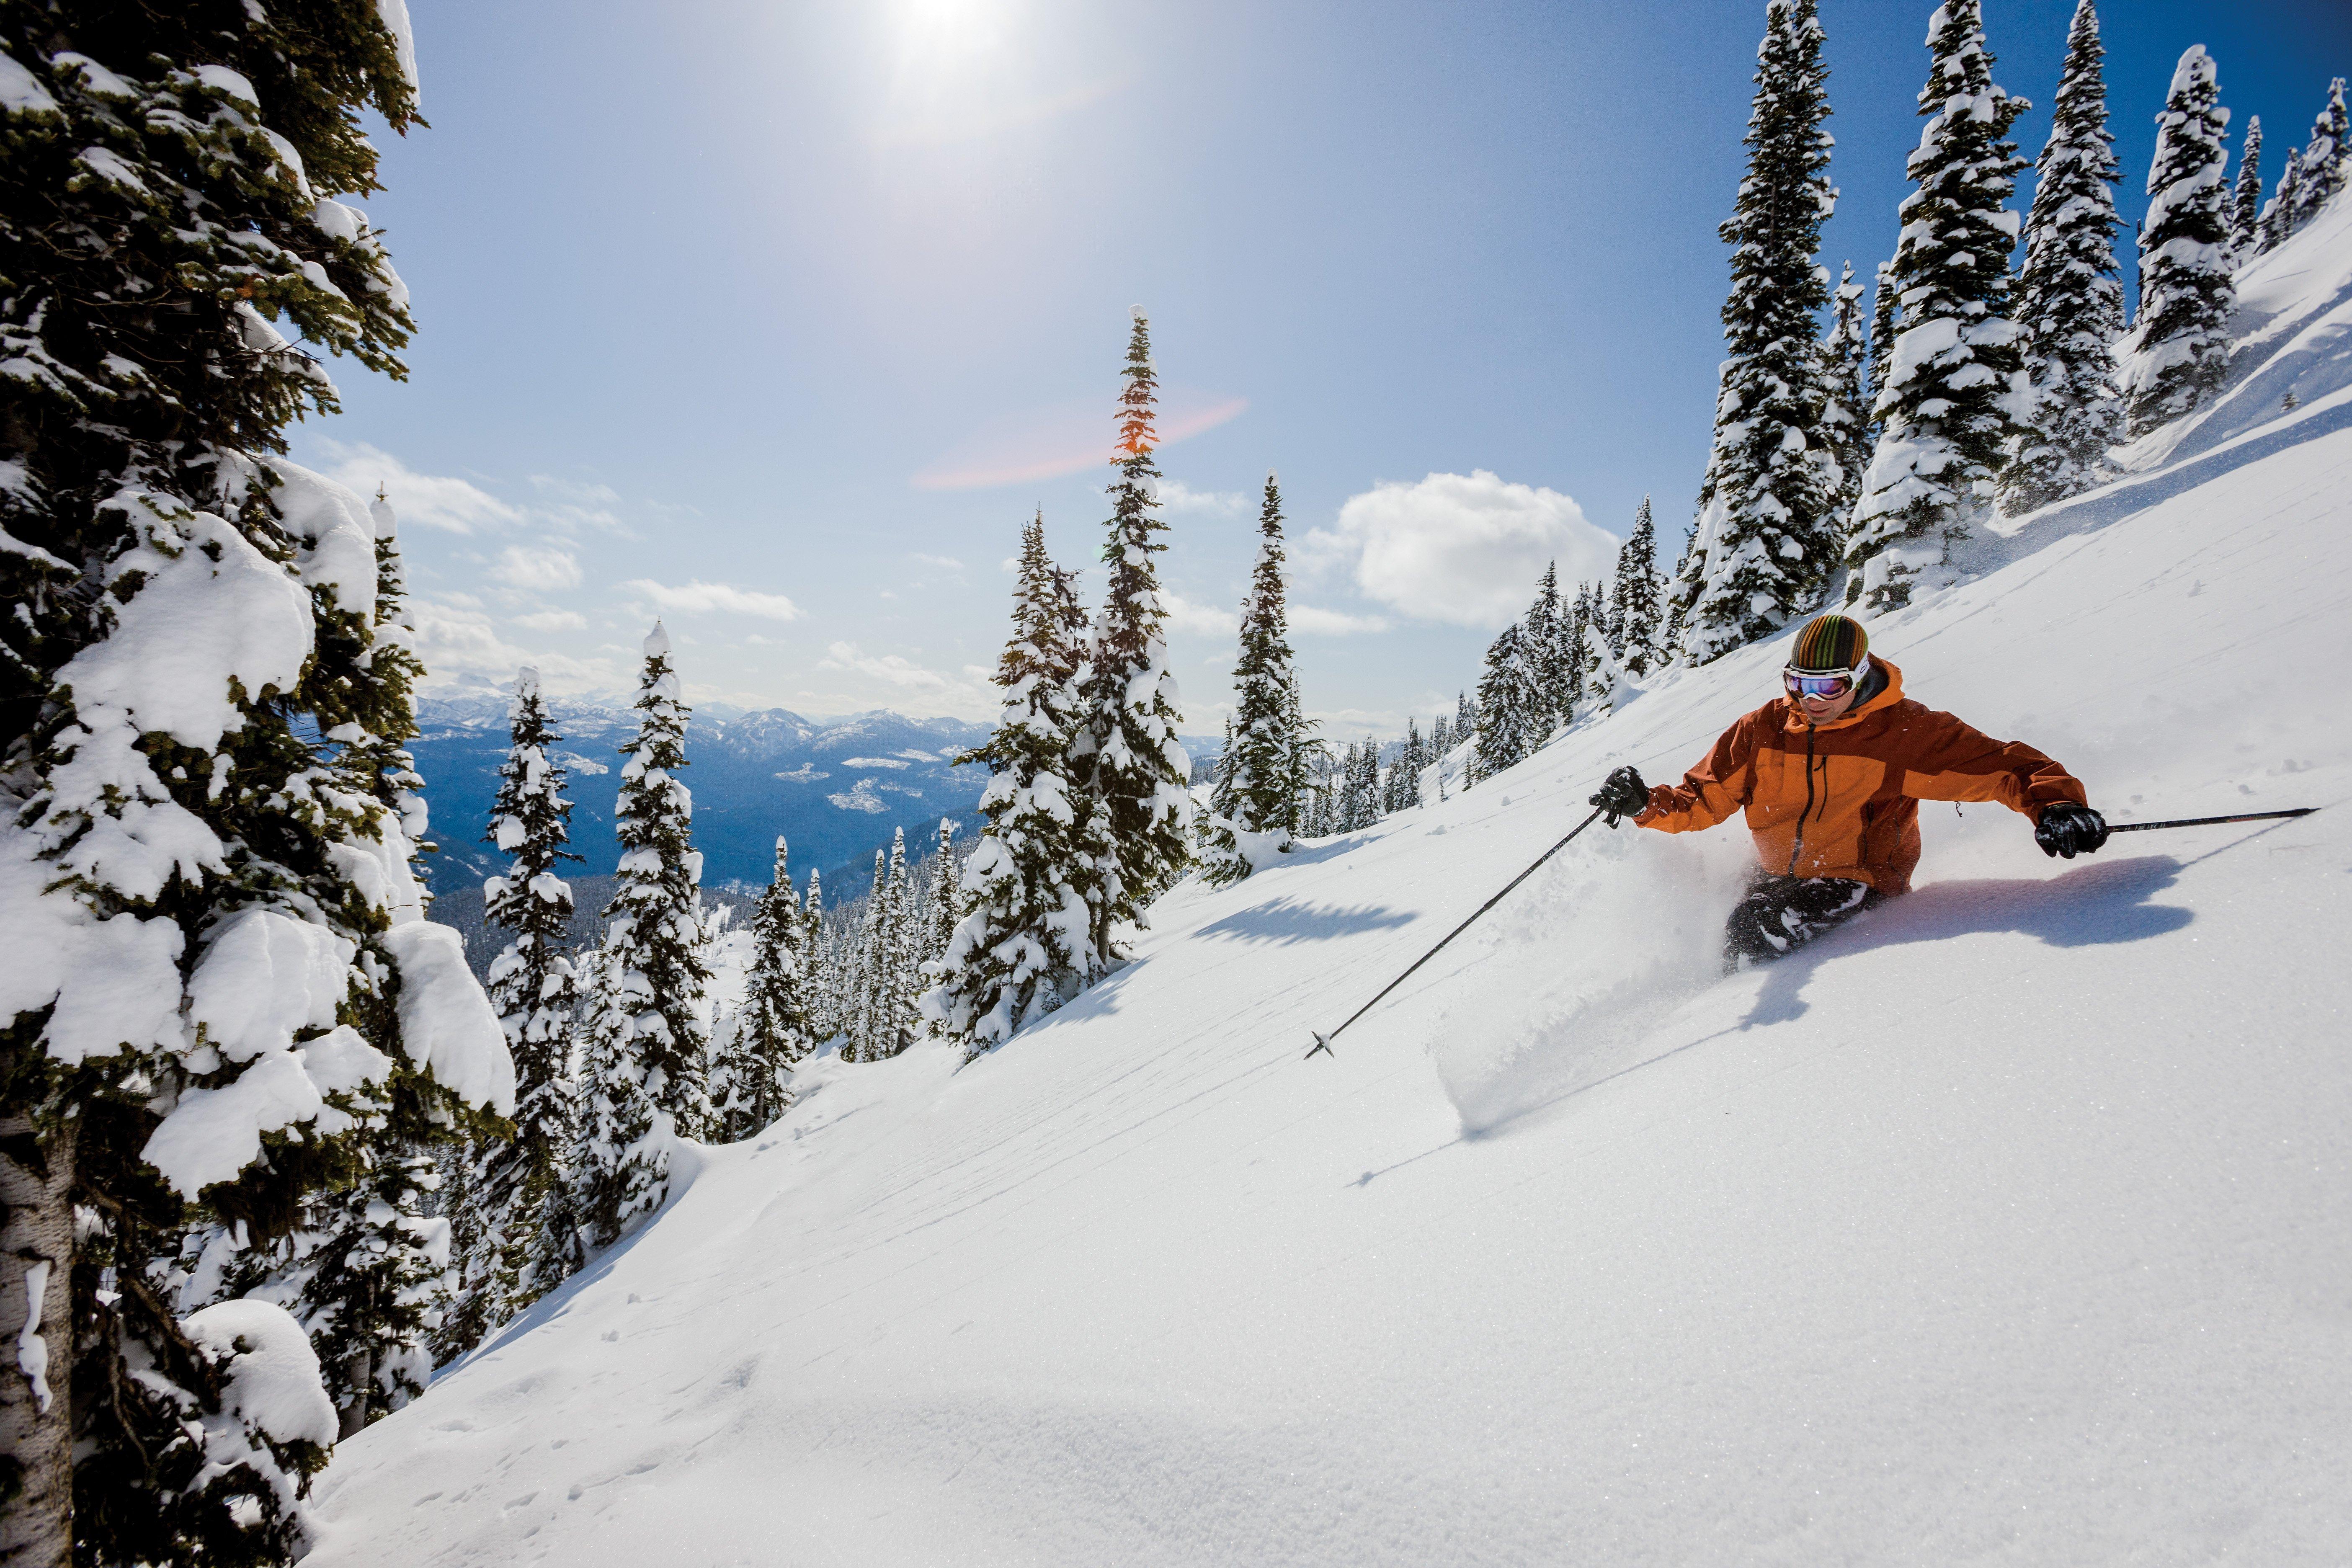 Hd skiing wallpaper